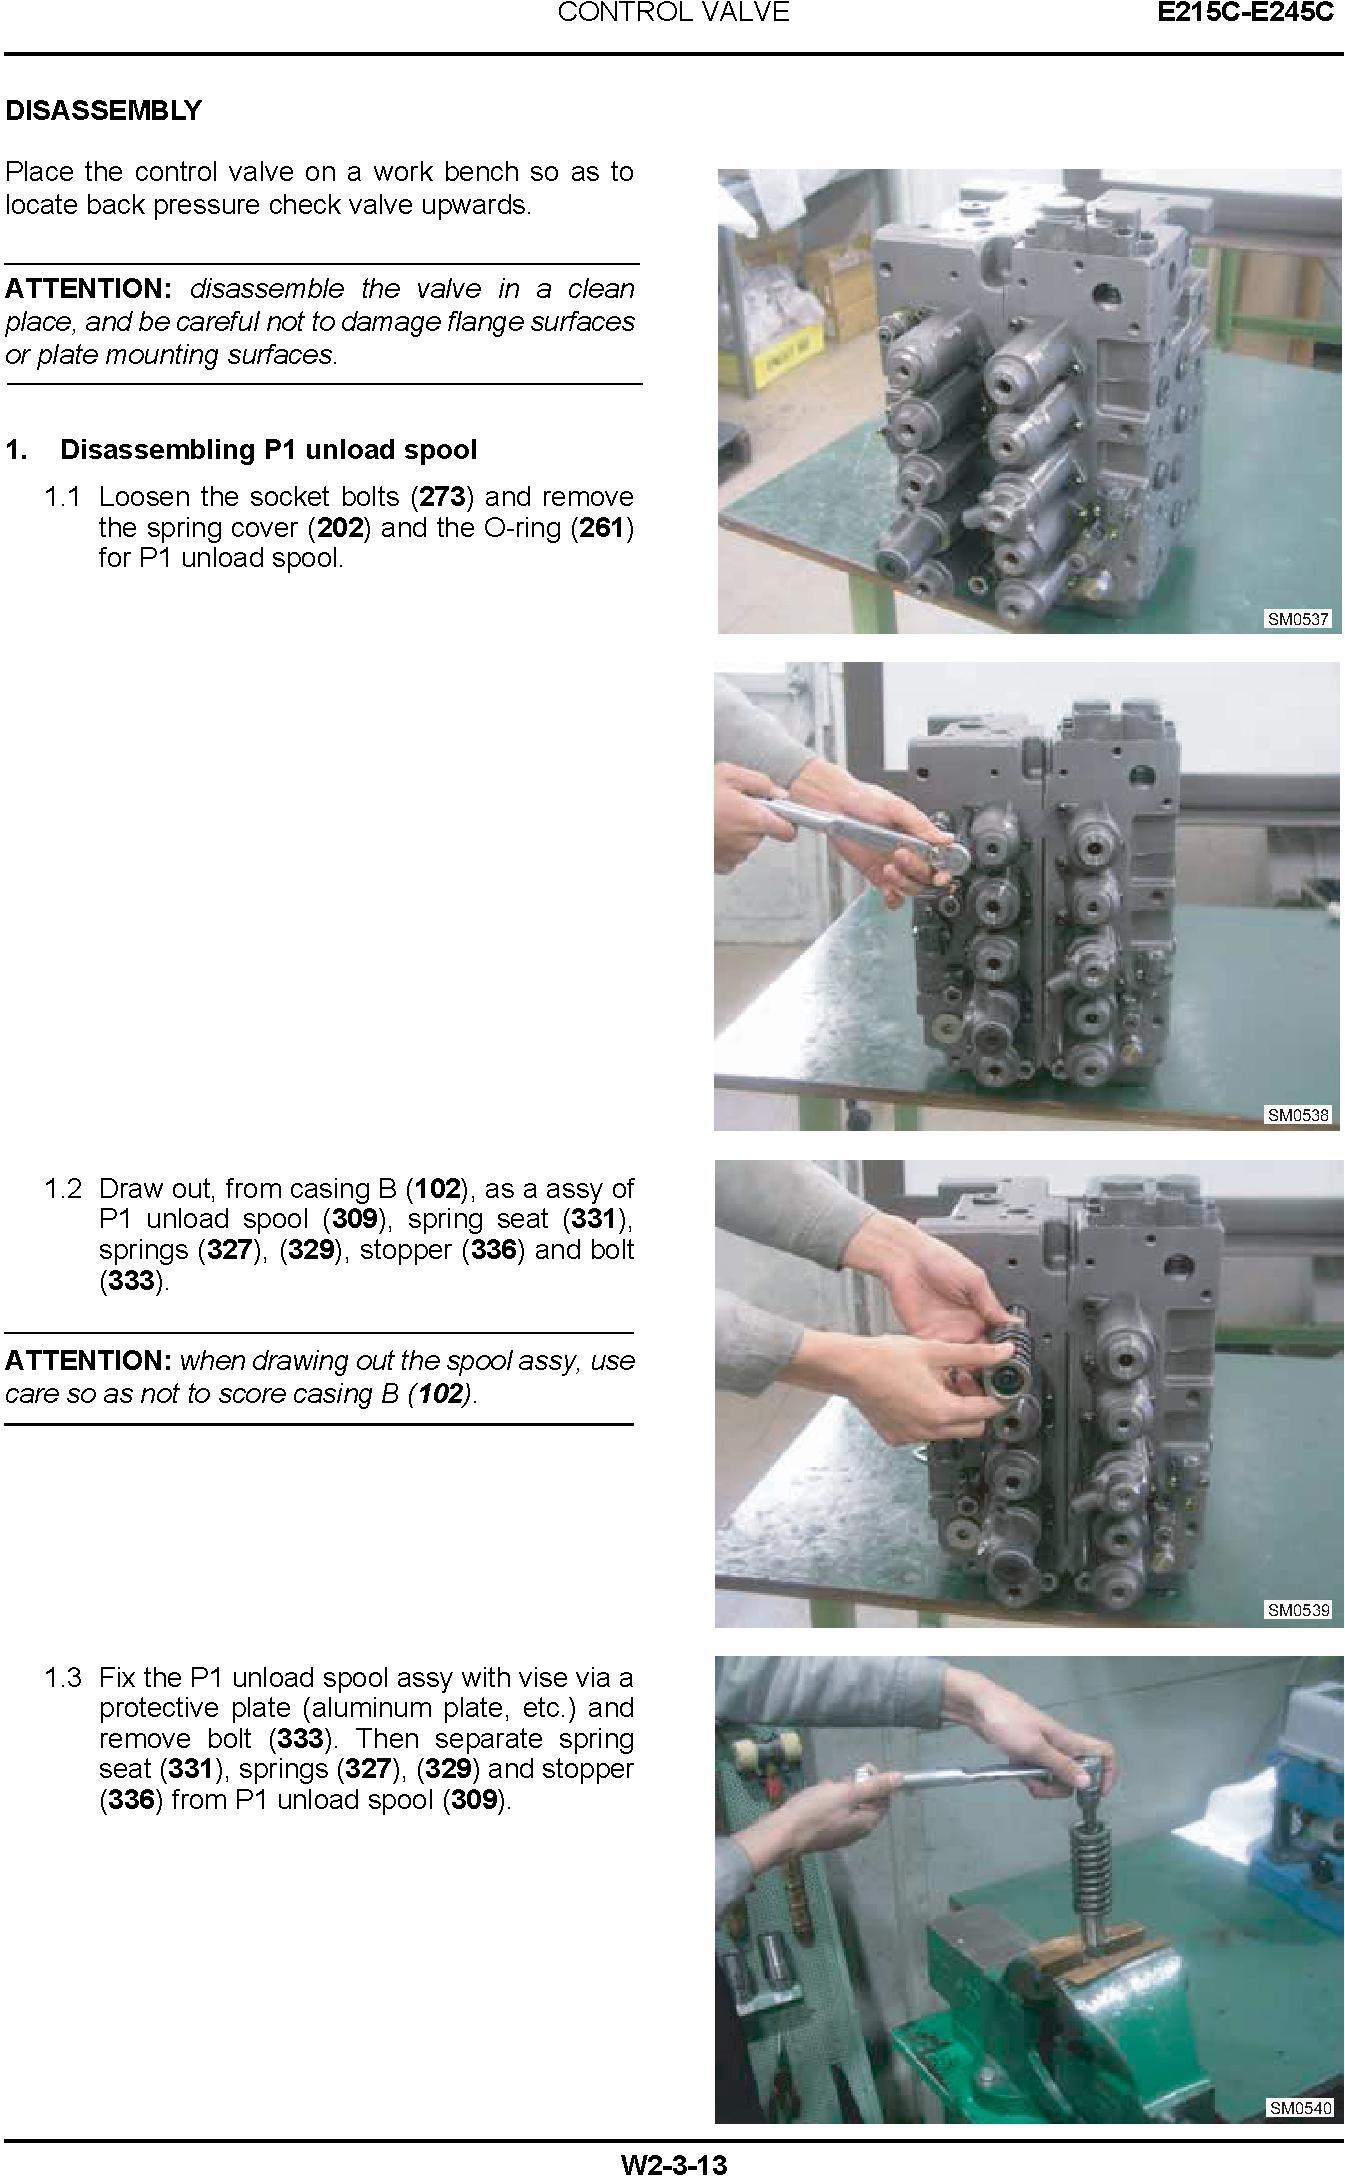 New Holland E215C, E245C Tier IV Crawler Excavators Service Manual (10-2011) - 3